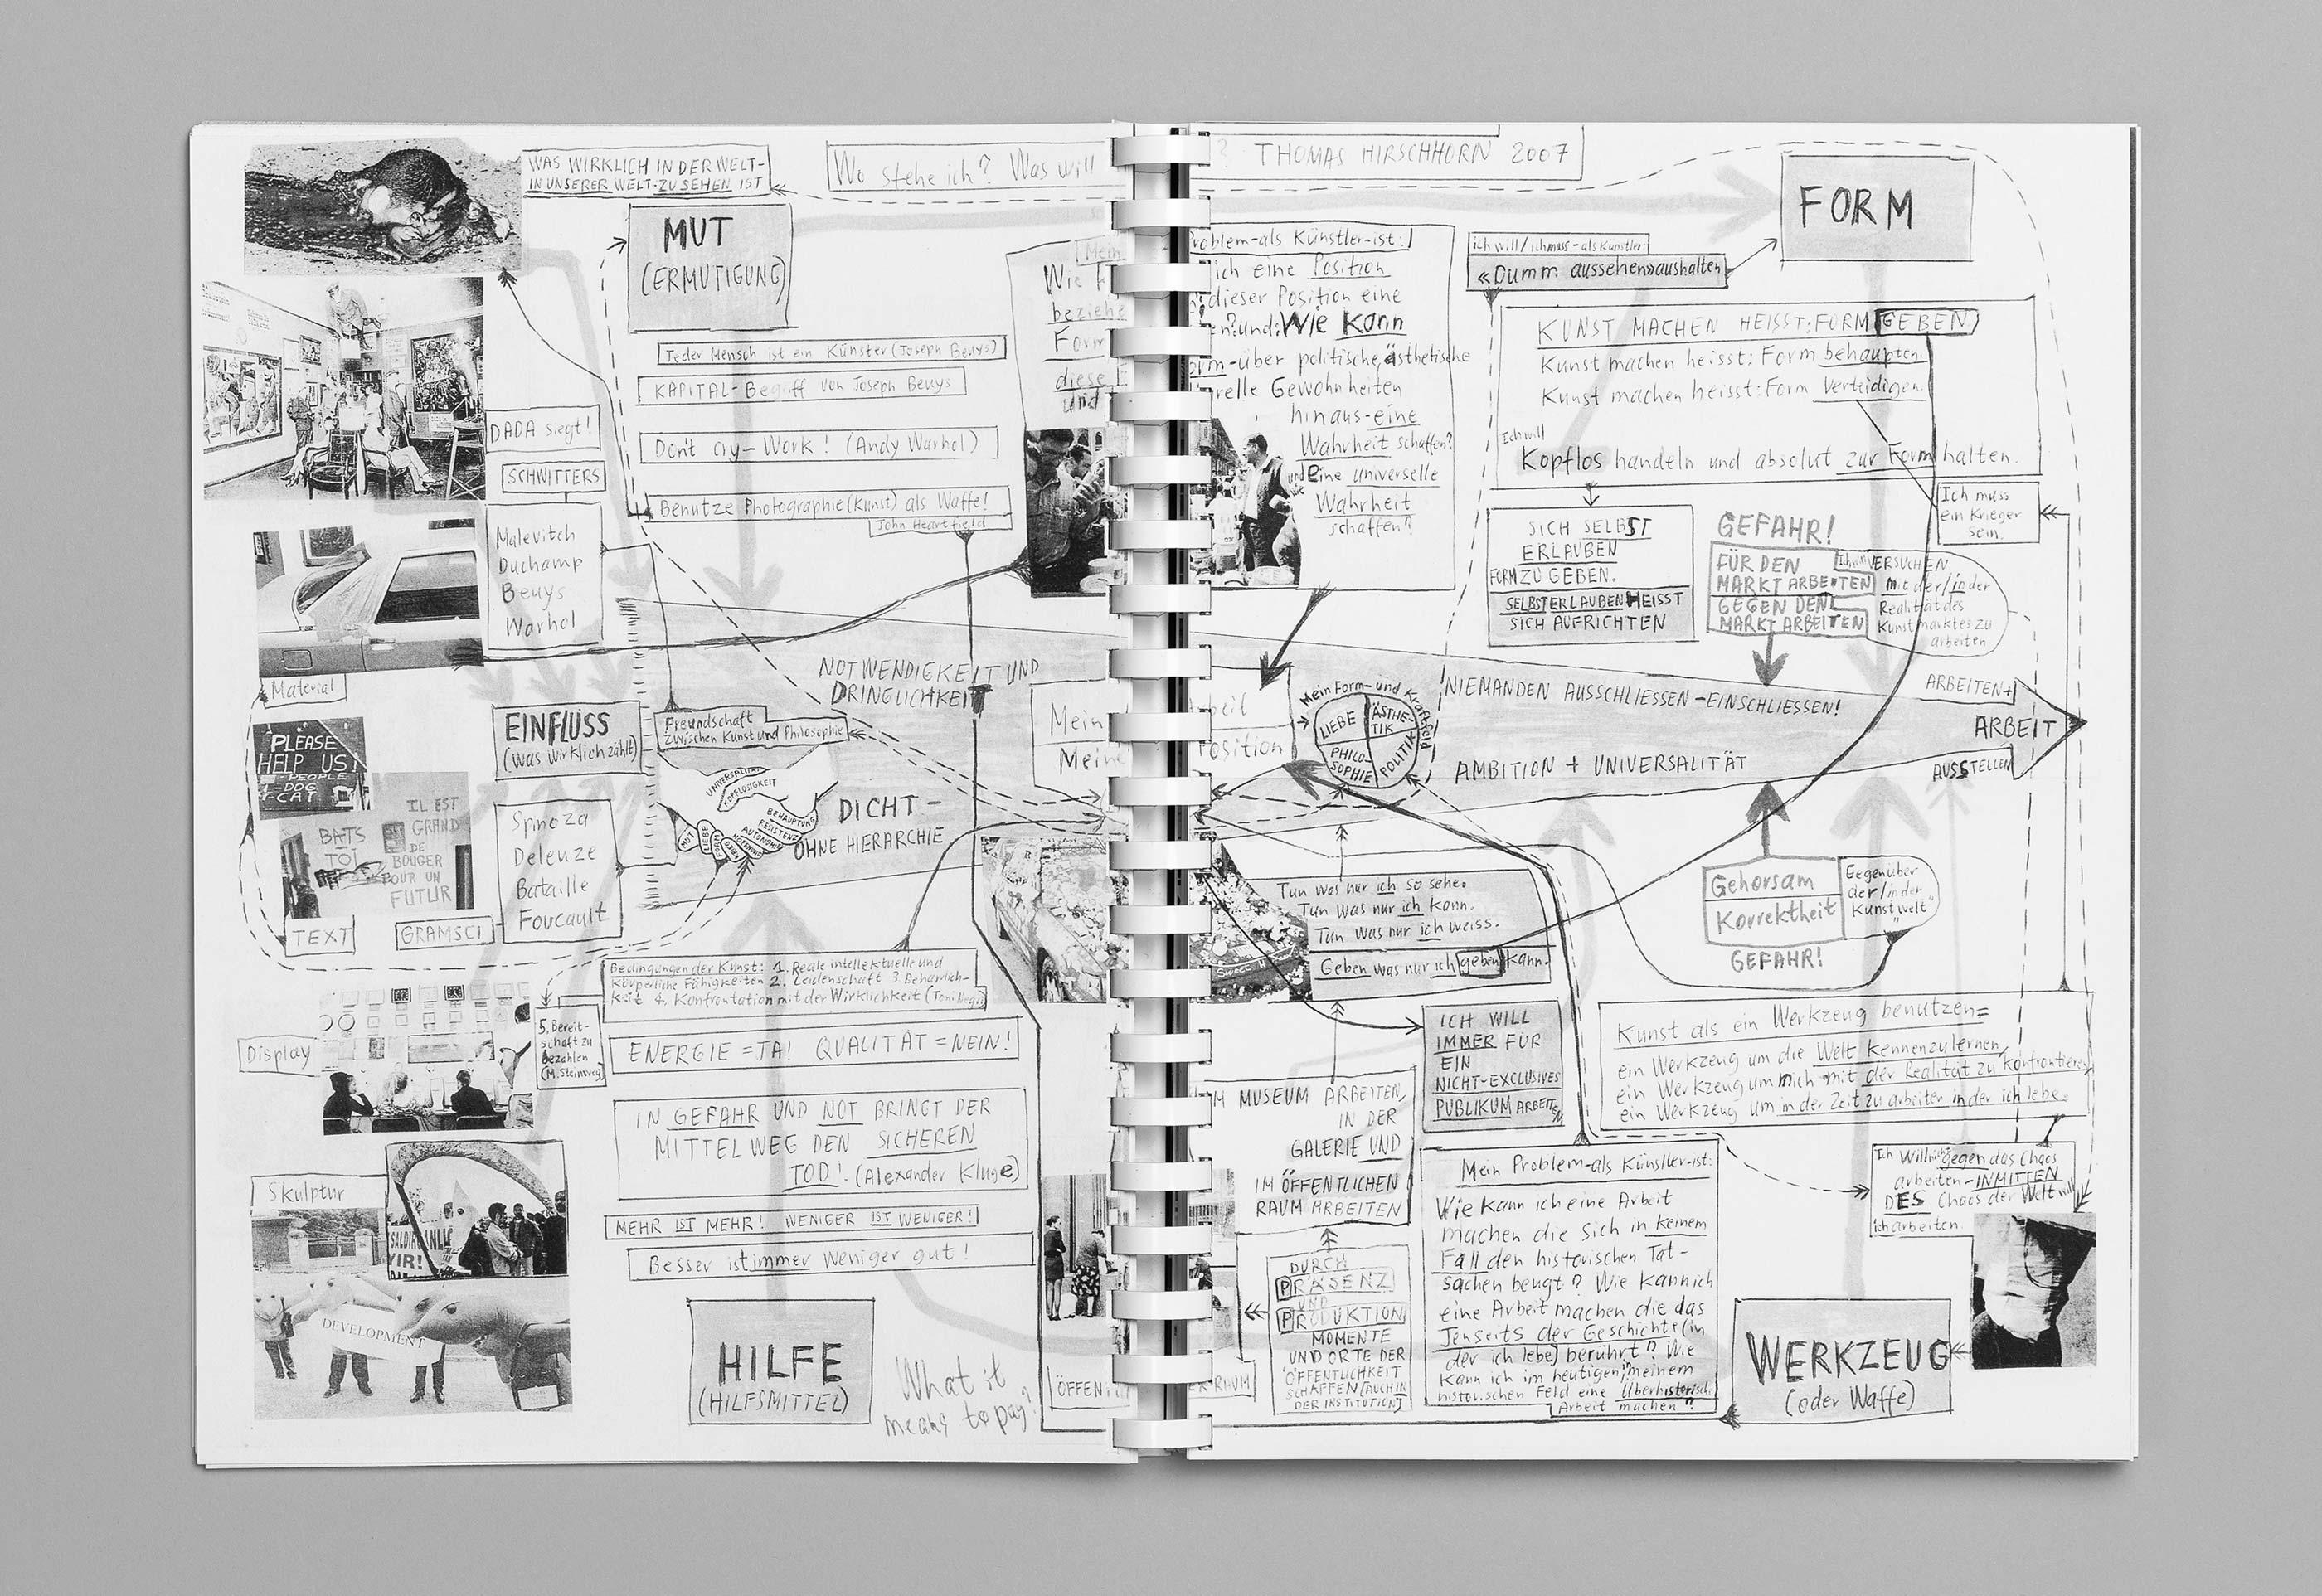 Sommerakademie im Zentrum Paul Klee 2016 – Publikation Thomas Hirschhorn, 07  ©Atelier Pol